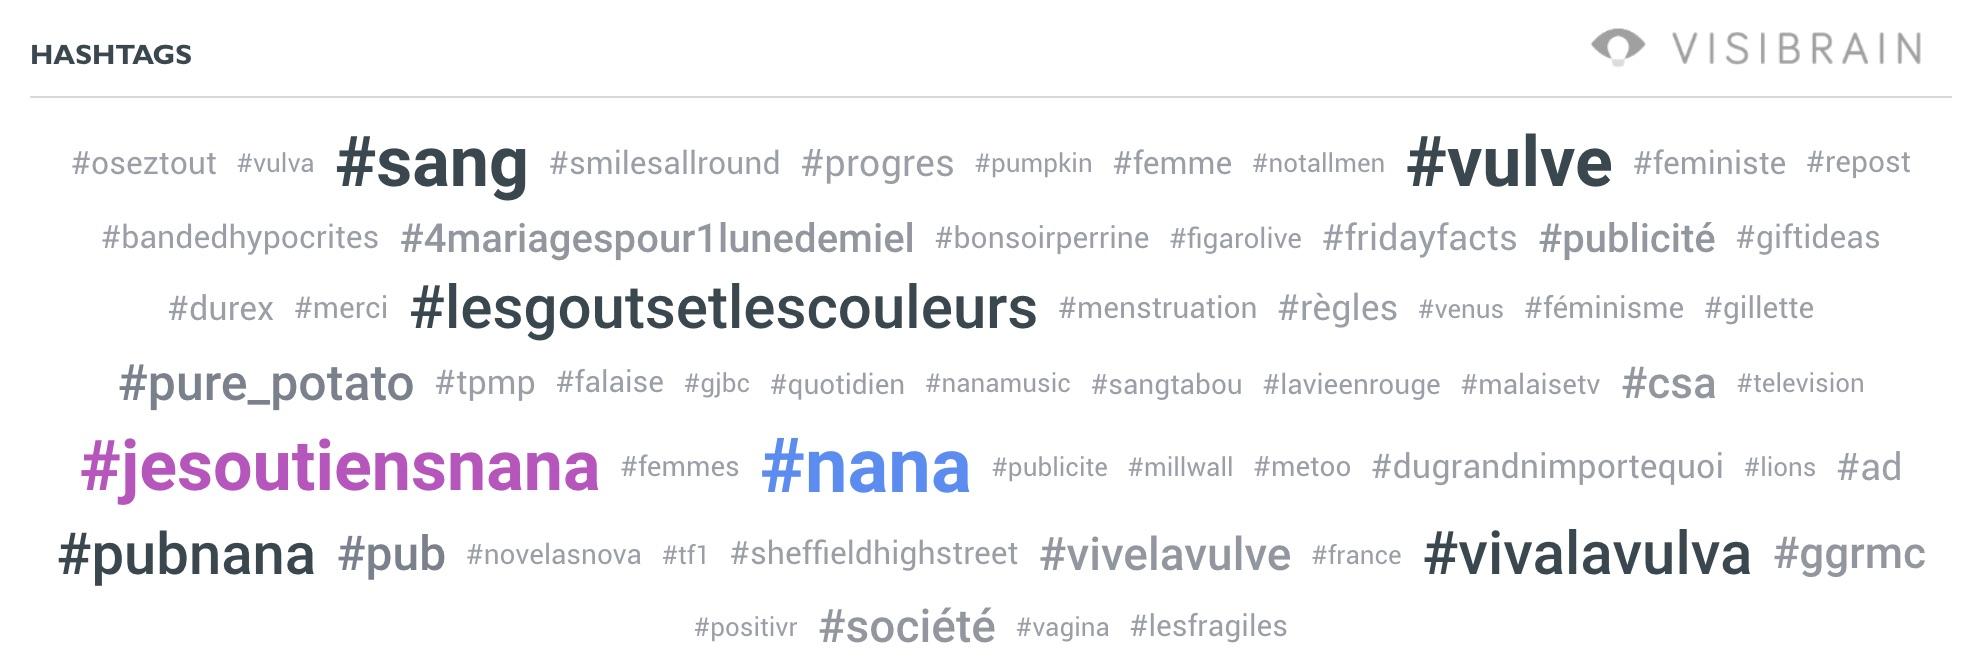 top hashtags campagne nana sur twitter